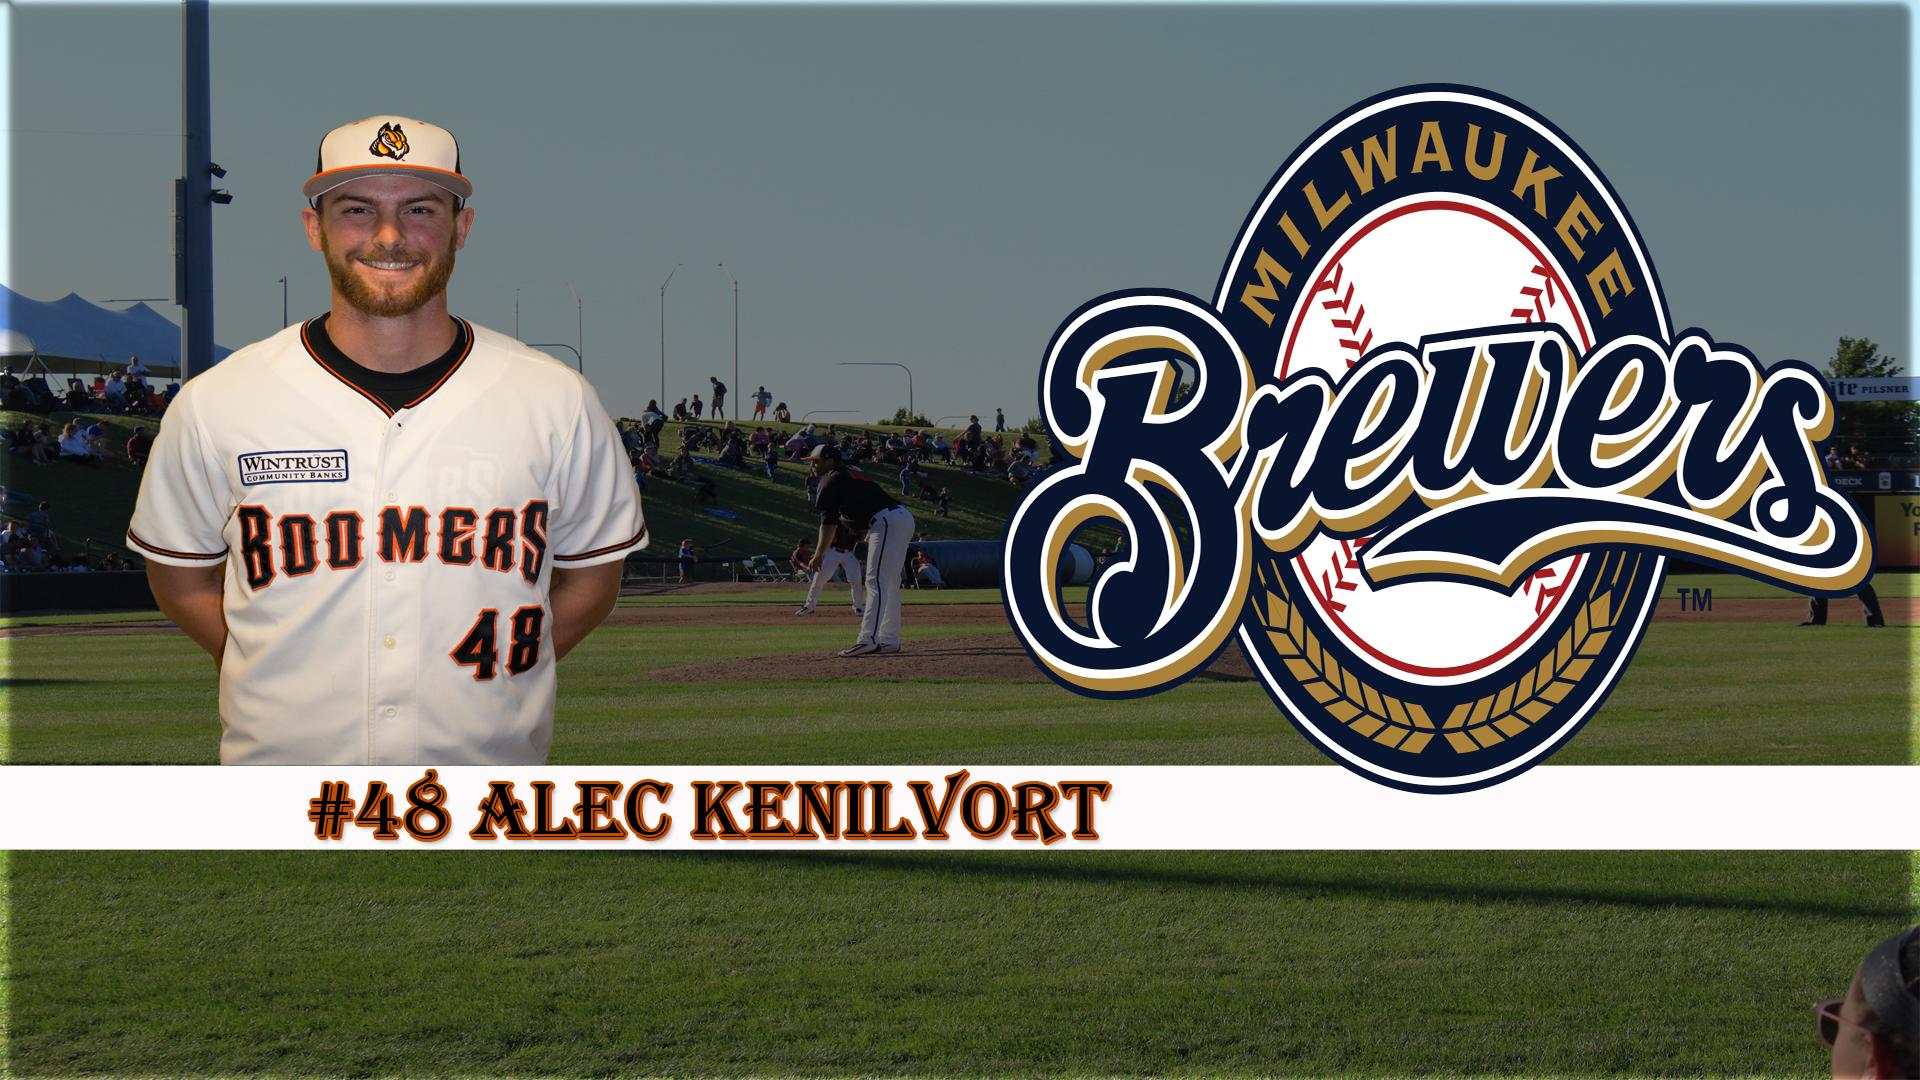 Kenilvort Joining Brewers Organization